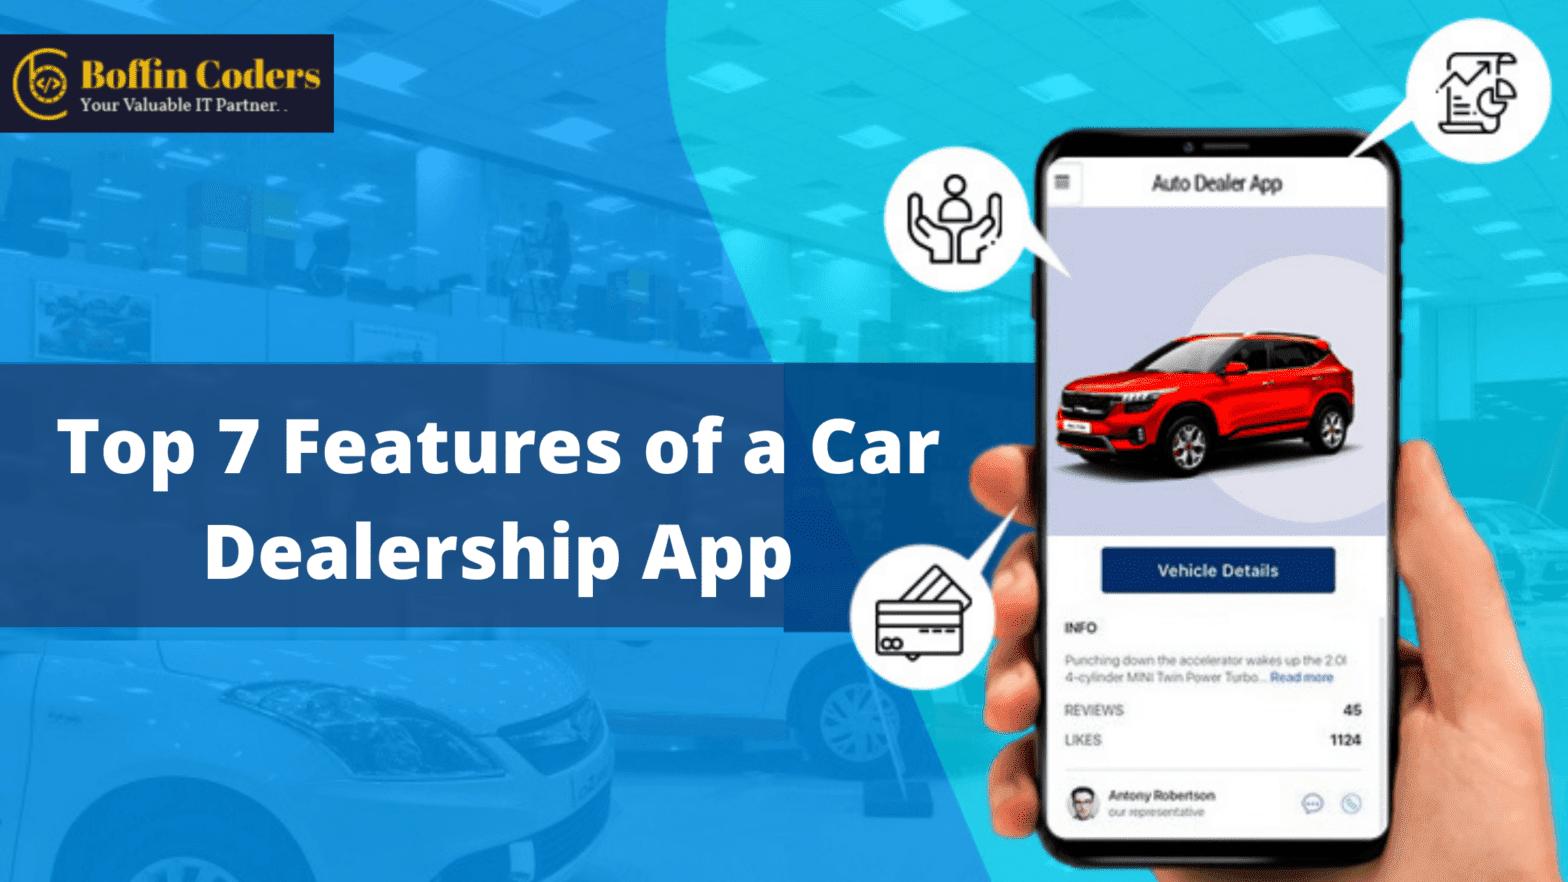 Top 7 Features of a Car Dealership App